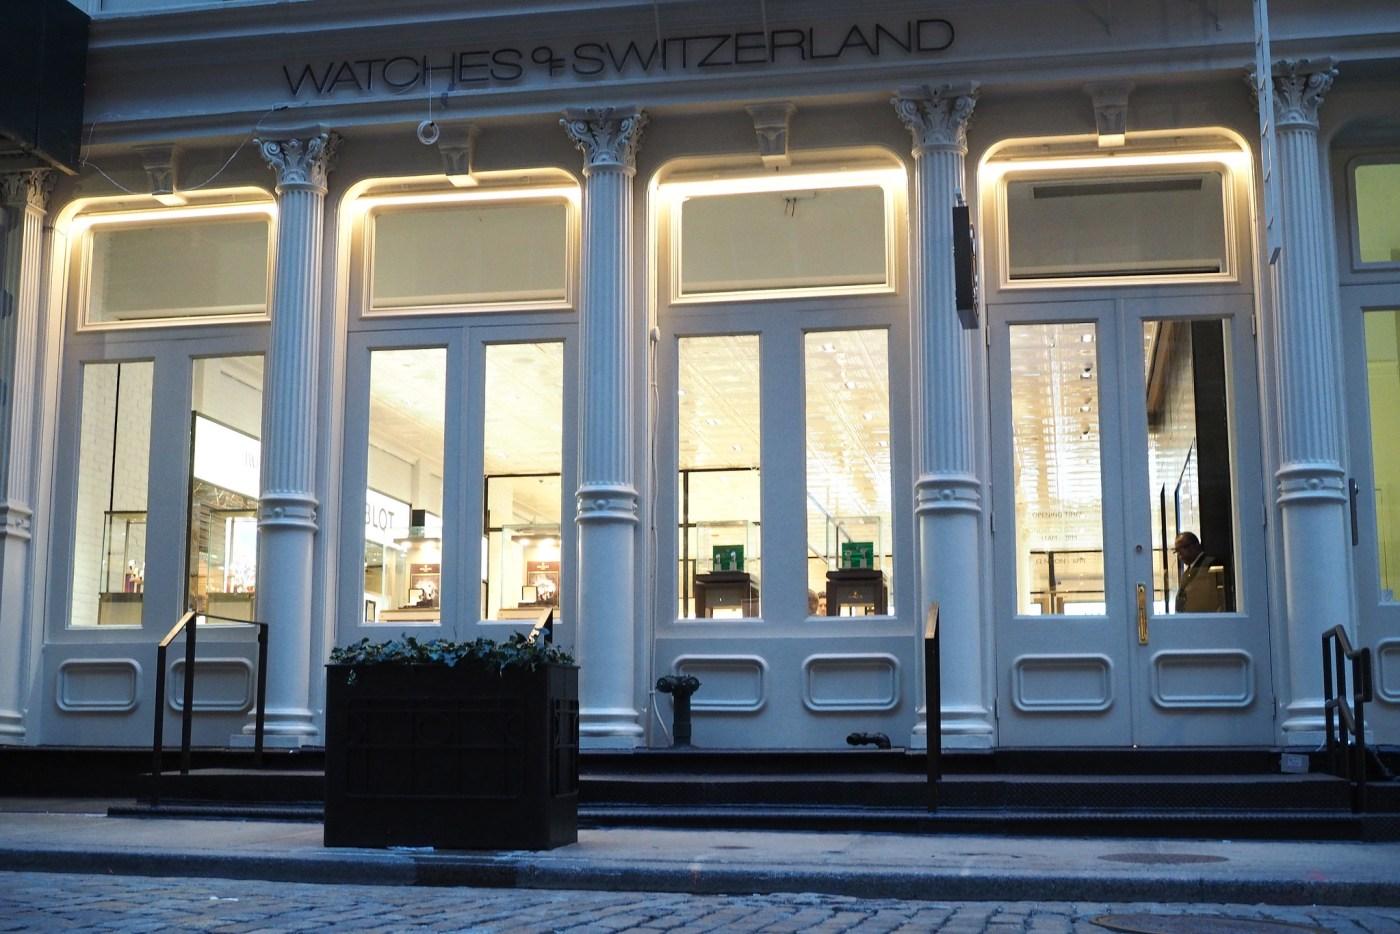 Watches of Switzerland located at 60 Greene Street in SoHo